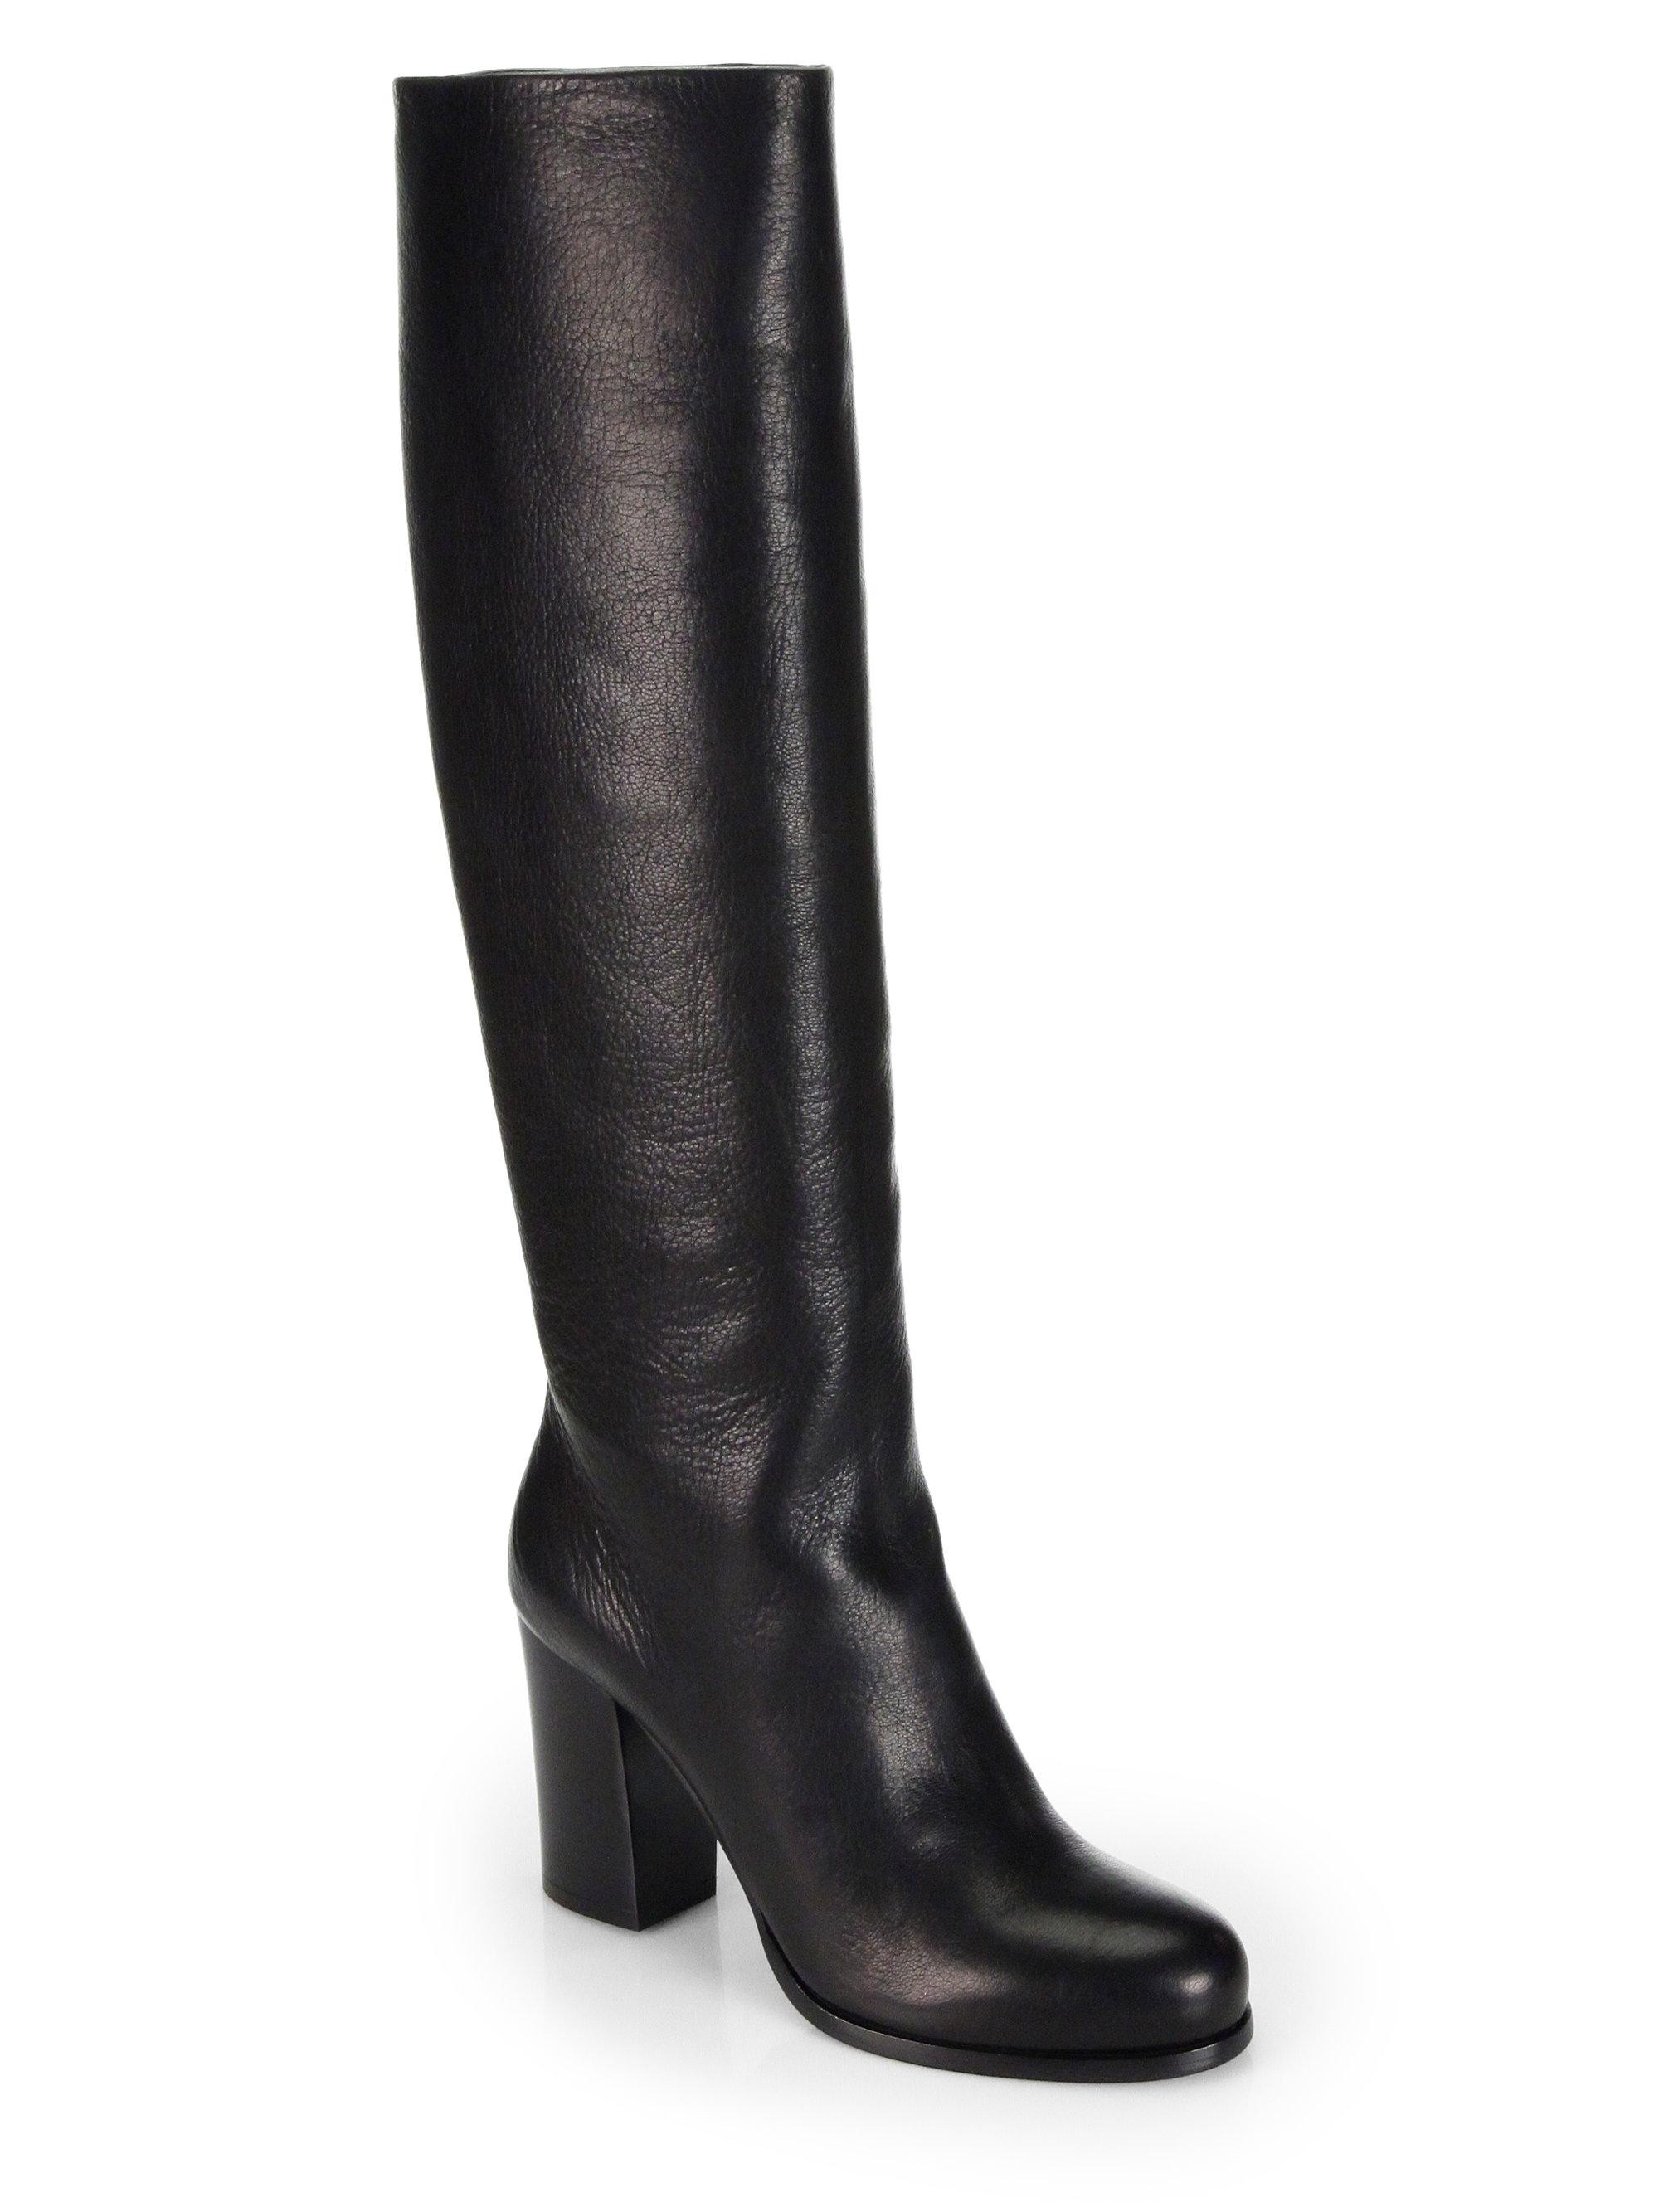 prada leather kneehigh boots in black nero black lyst